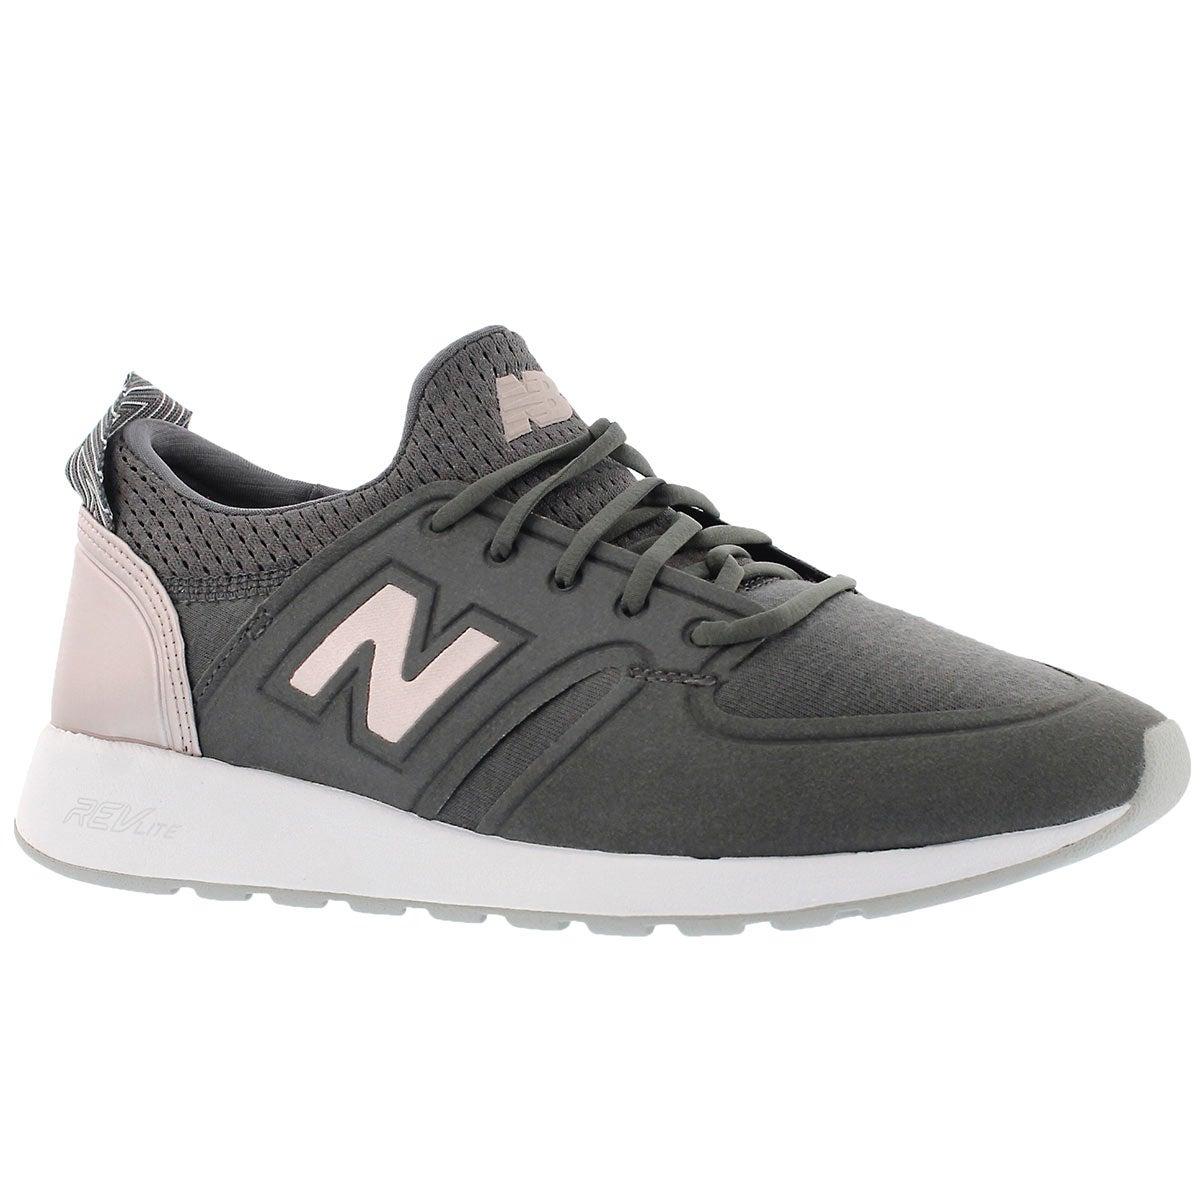 Women's 420 magenta/champ metallic laceup sneakers